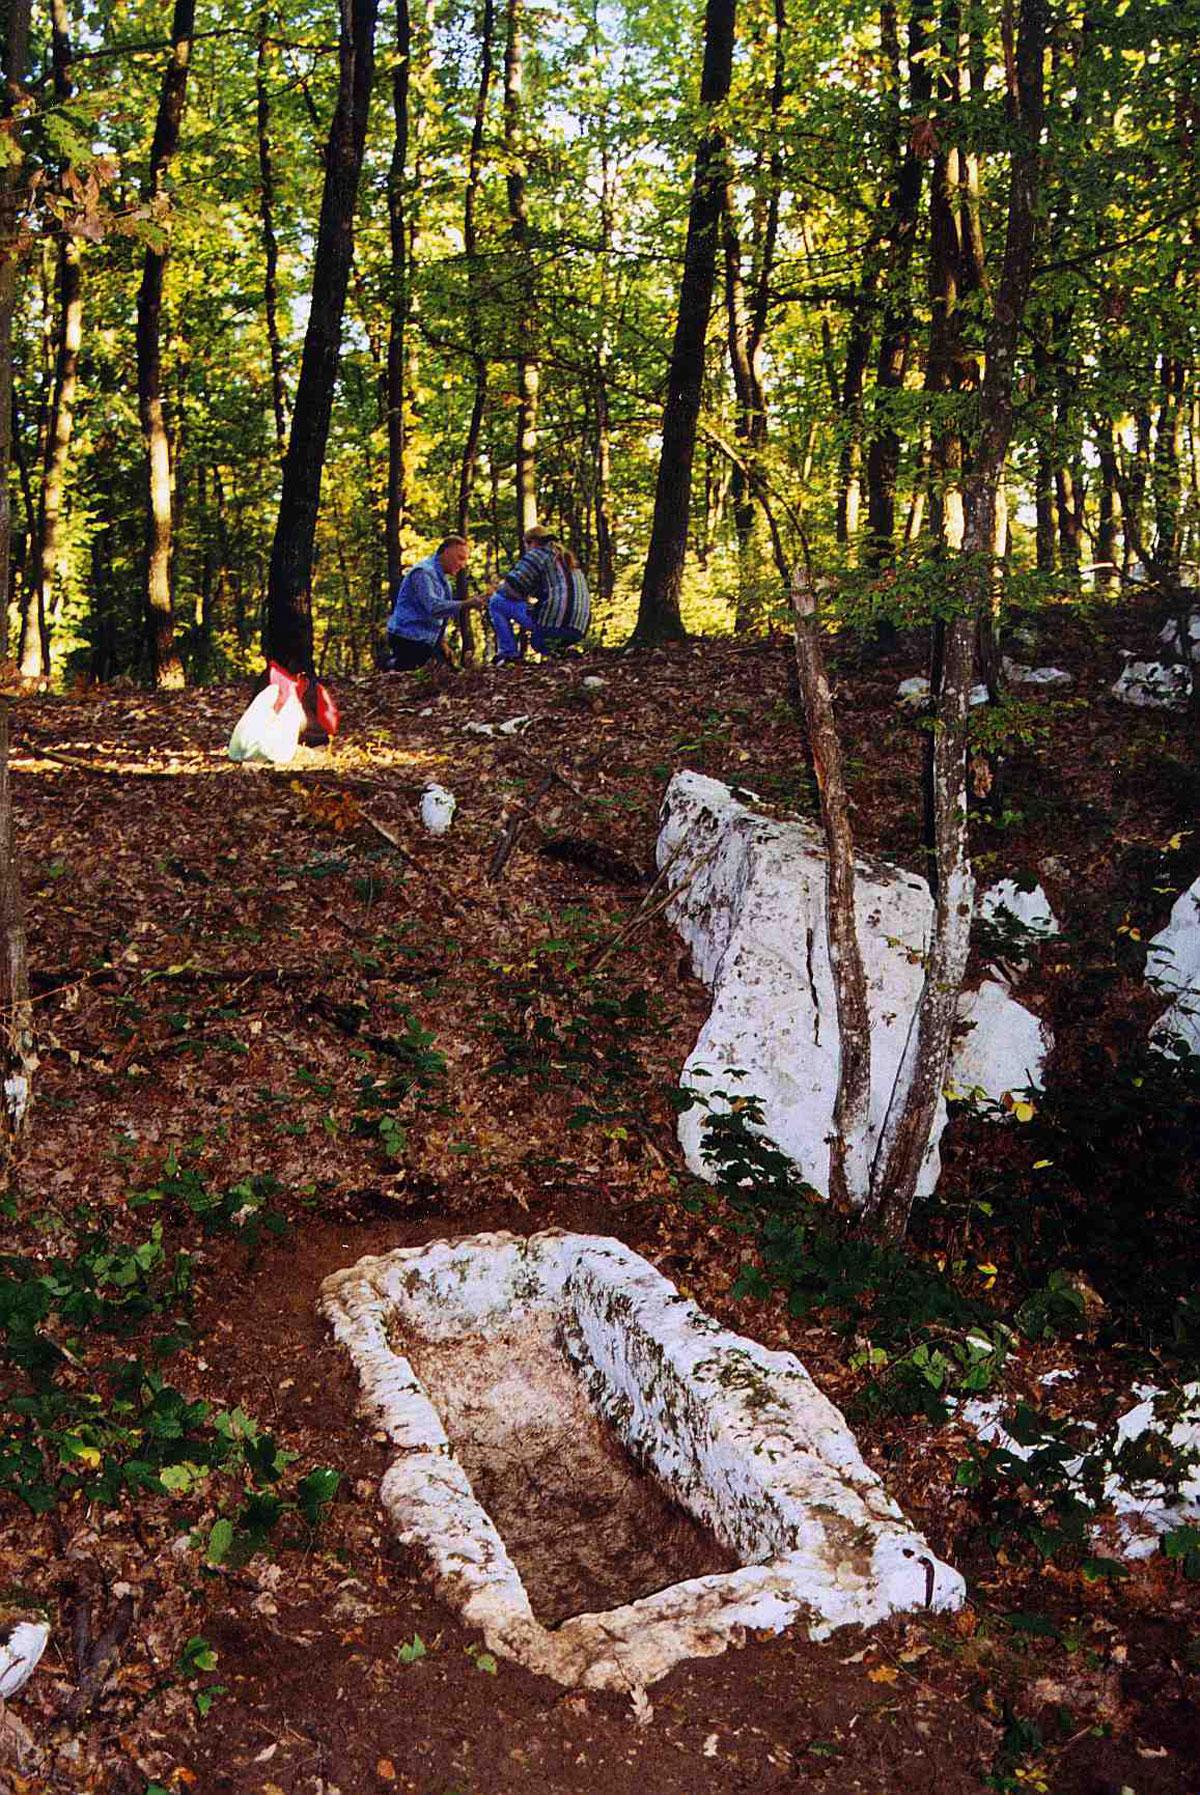 quarries of the roman sarchophagi and stone urns, karlovac region